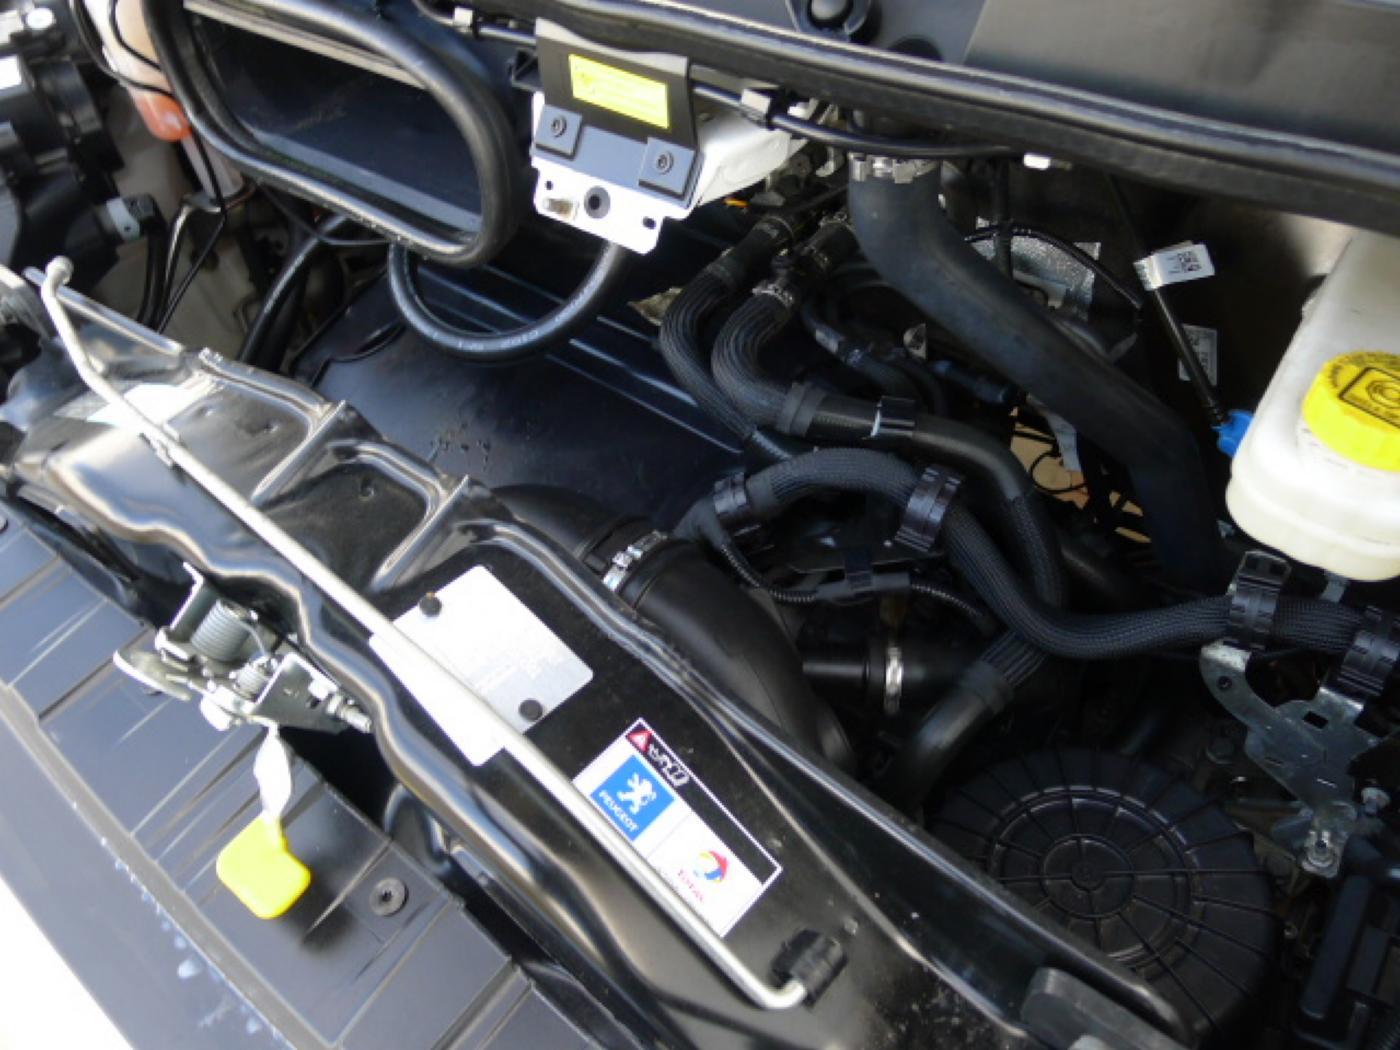 Peugeot Boxer 2,2 HDI Valnik+Plachta+Klima+Mìchy - 18